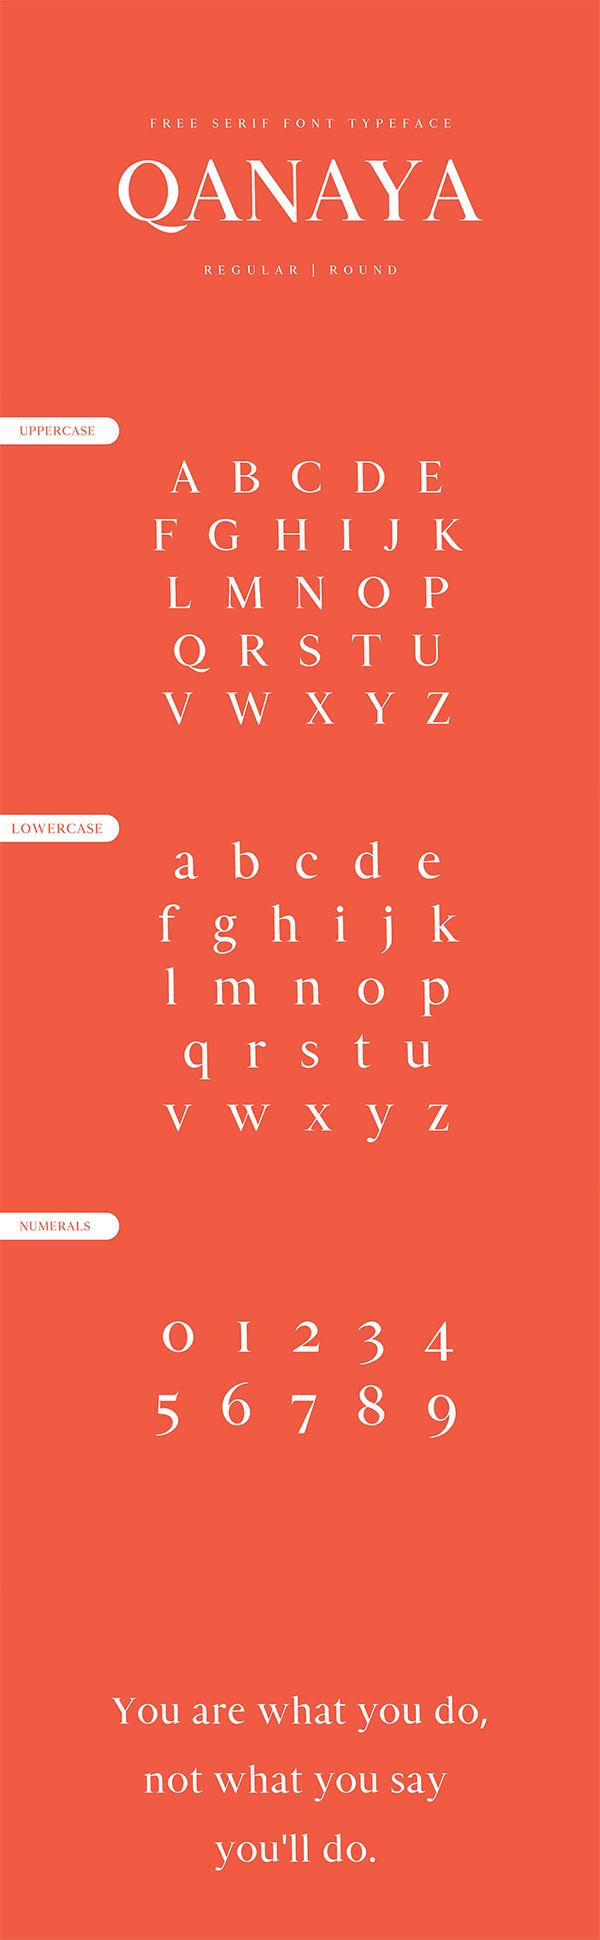 Qanaya Serif Free Font